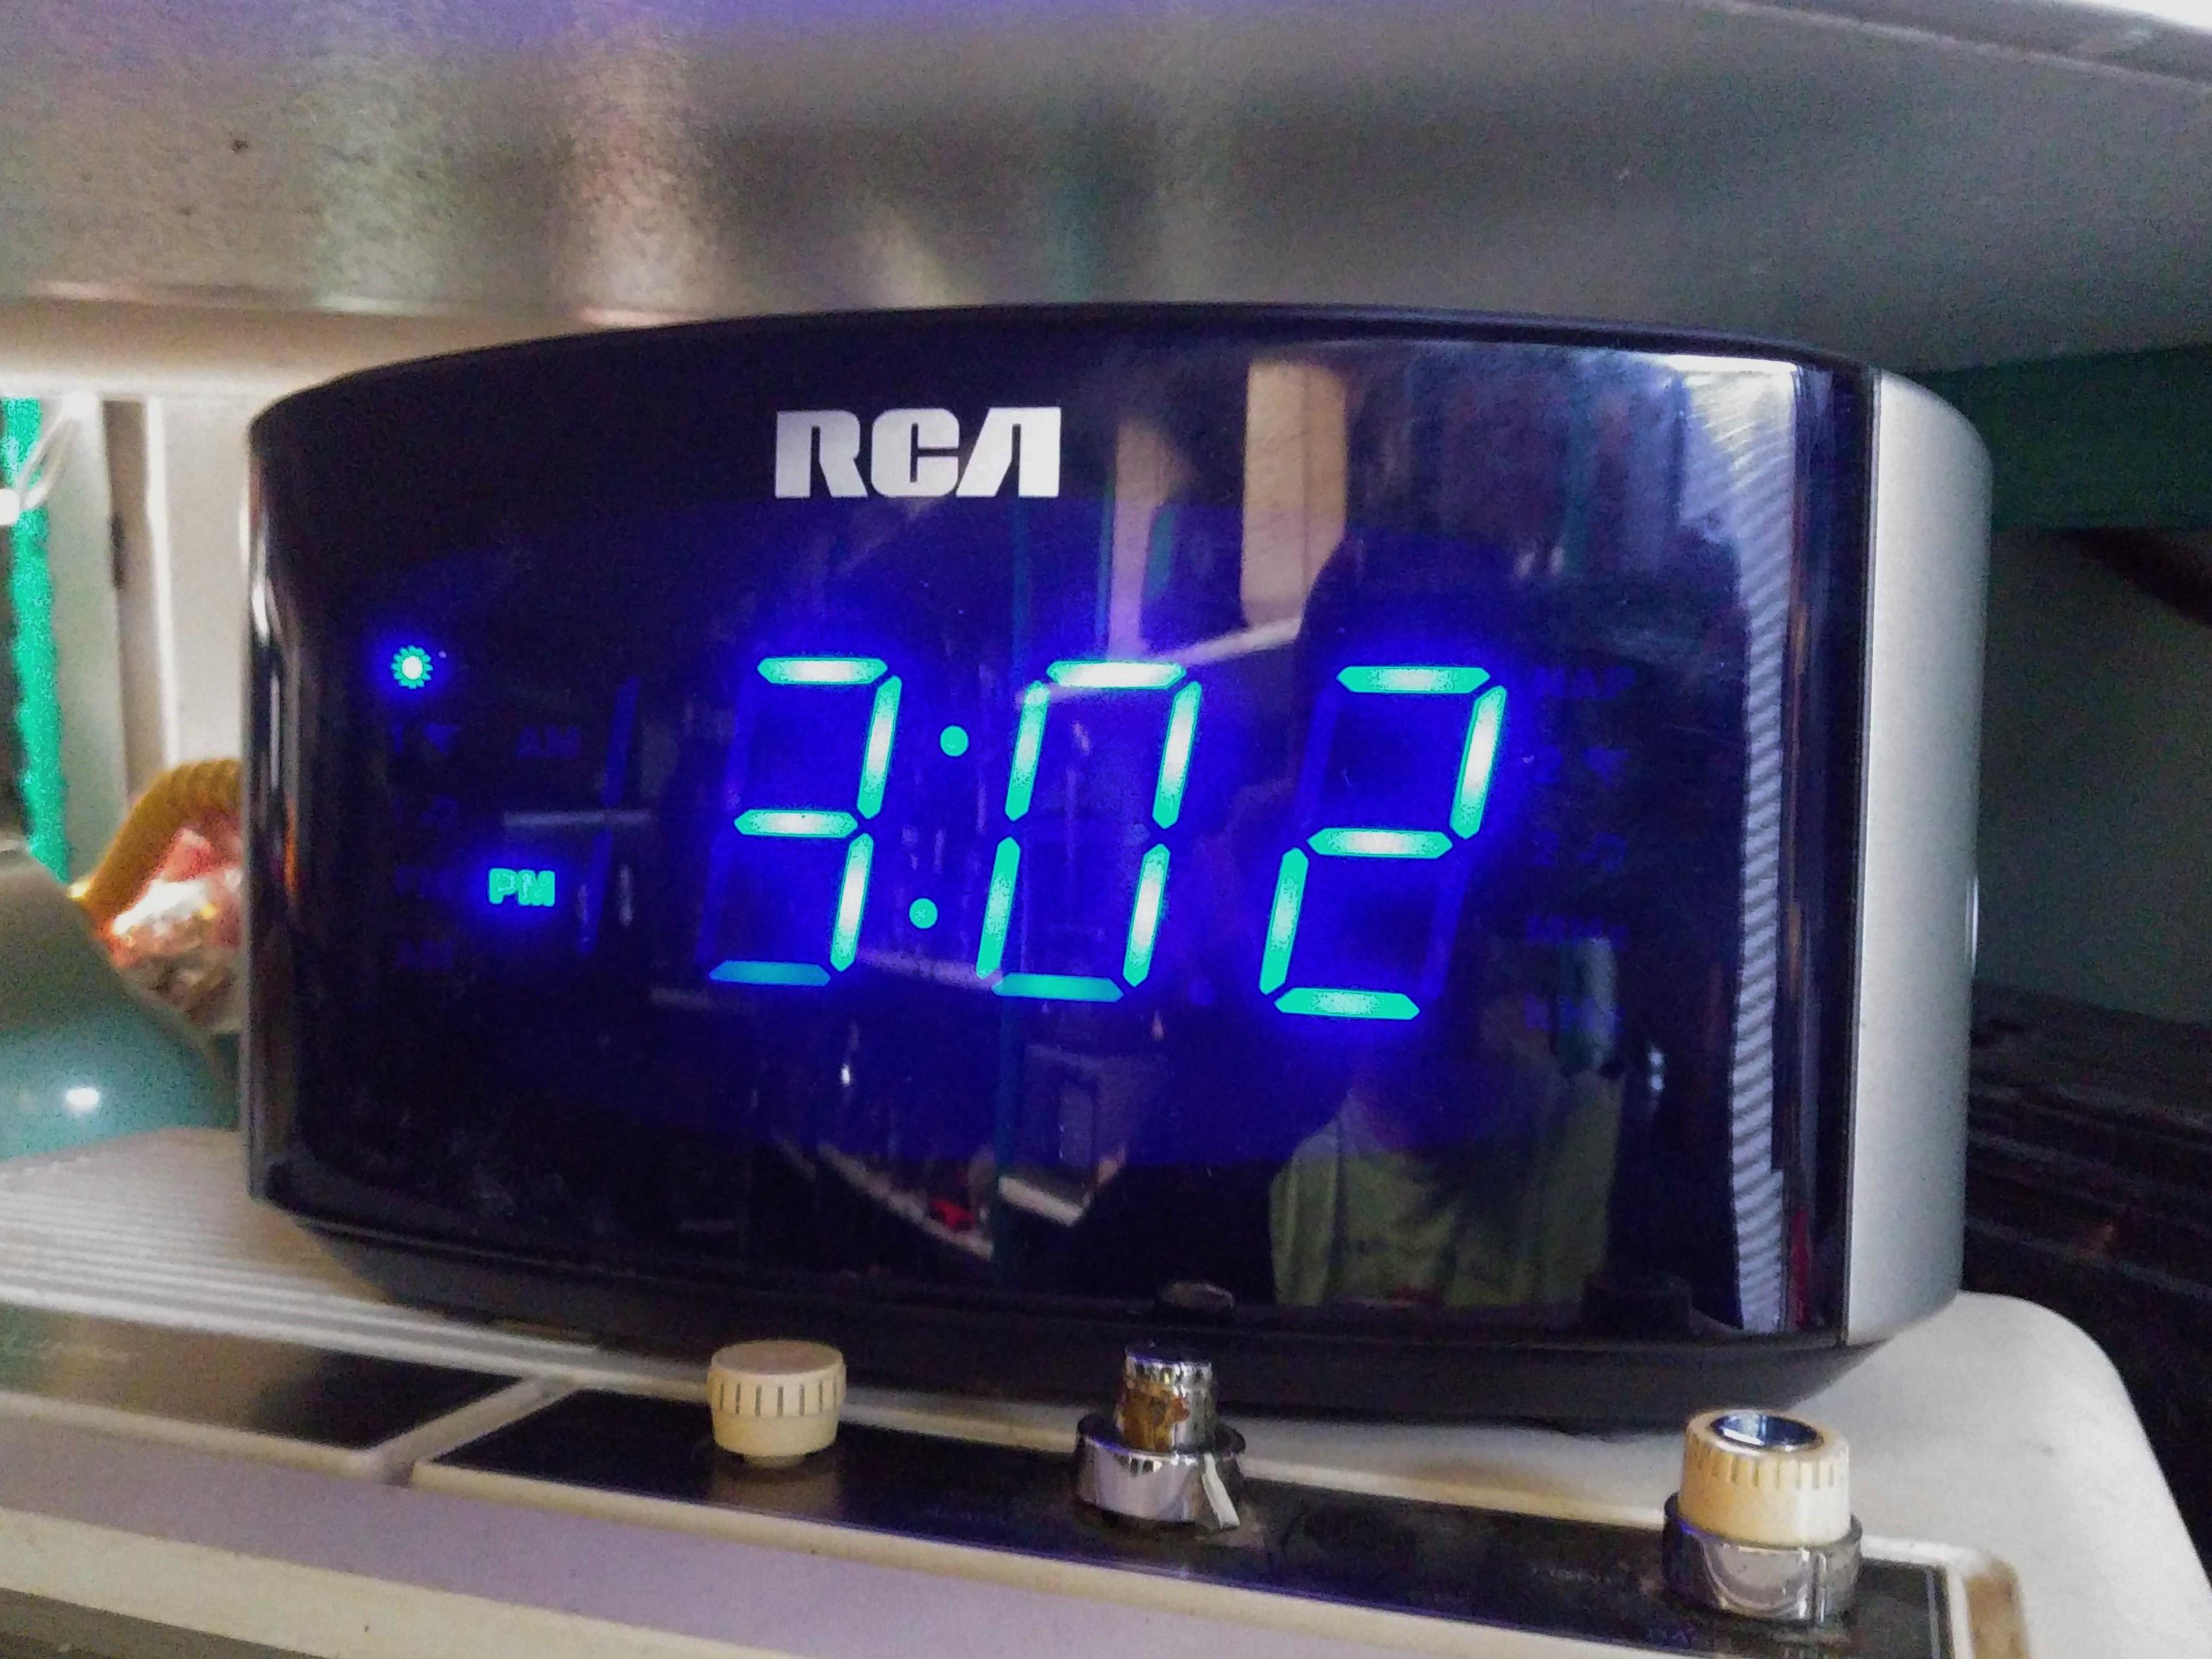 RCA Digital Alarm Clock